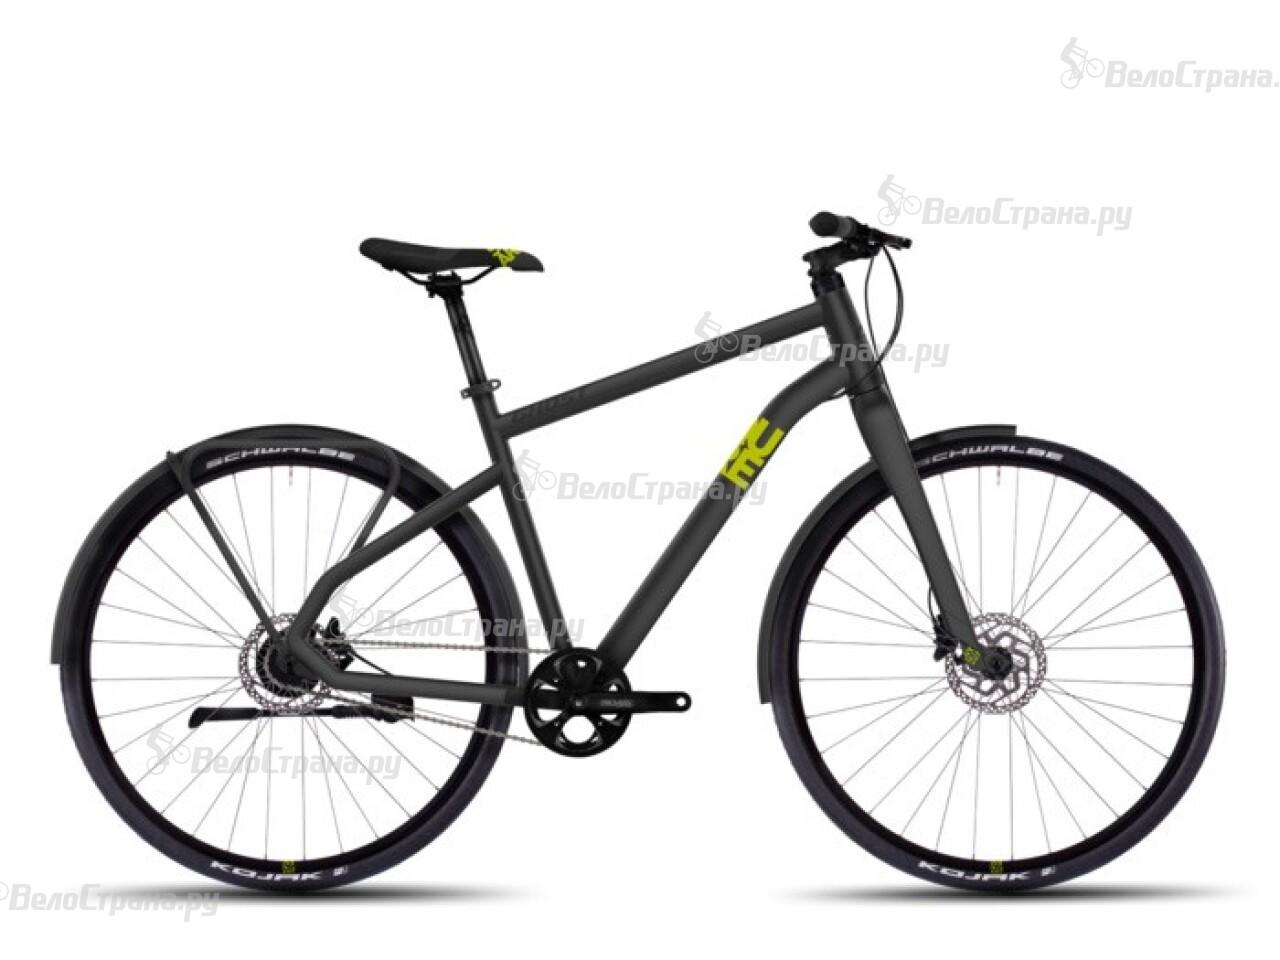 Велосипед Ghost SQUARE Urban 4 (2016) цены онлайн